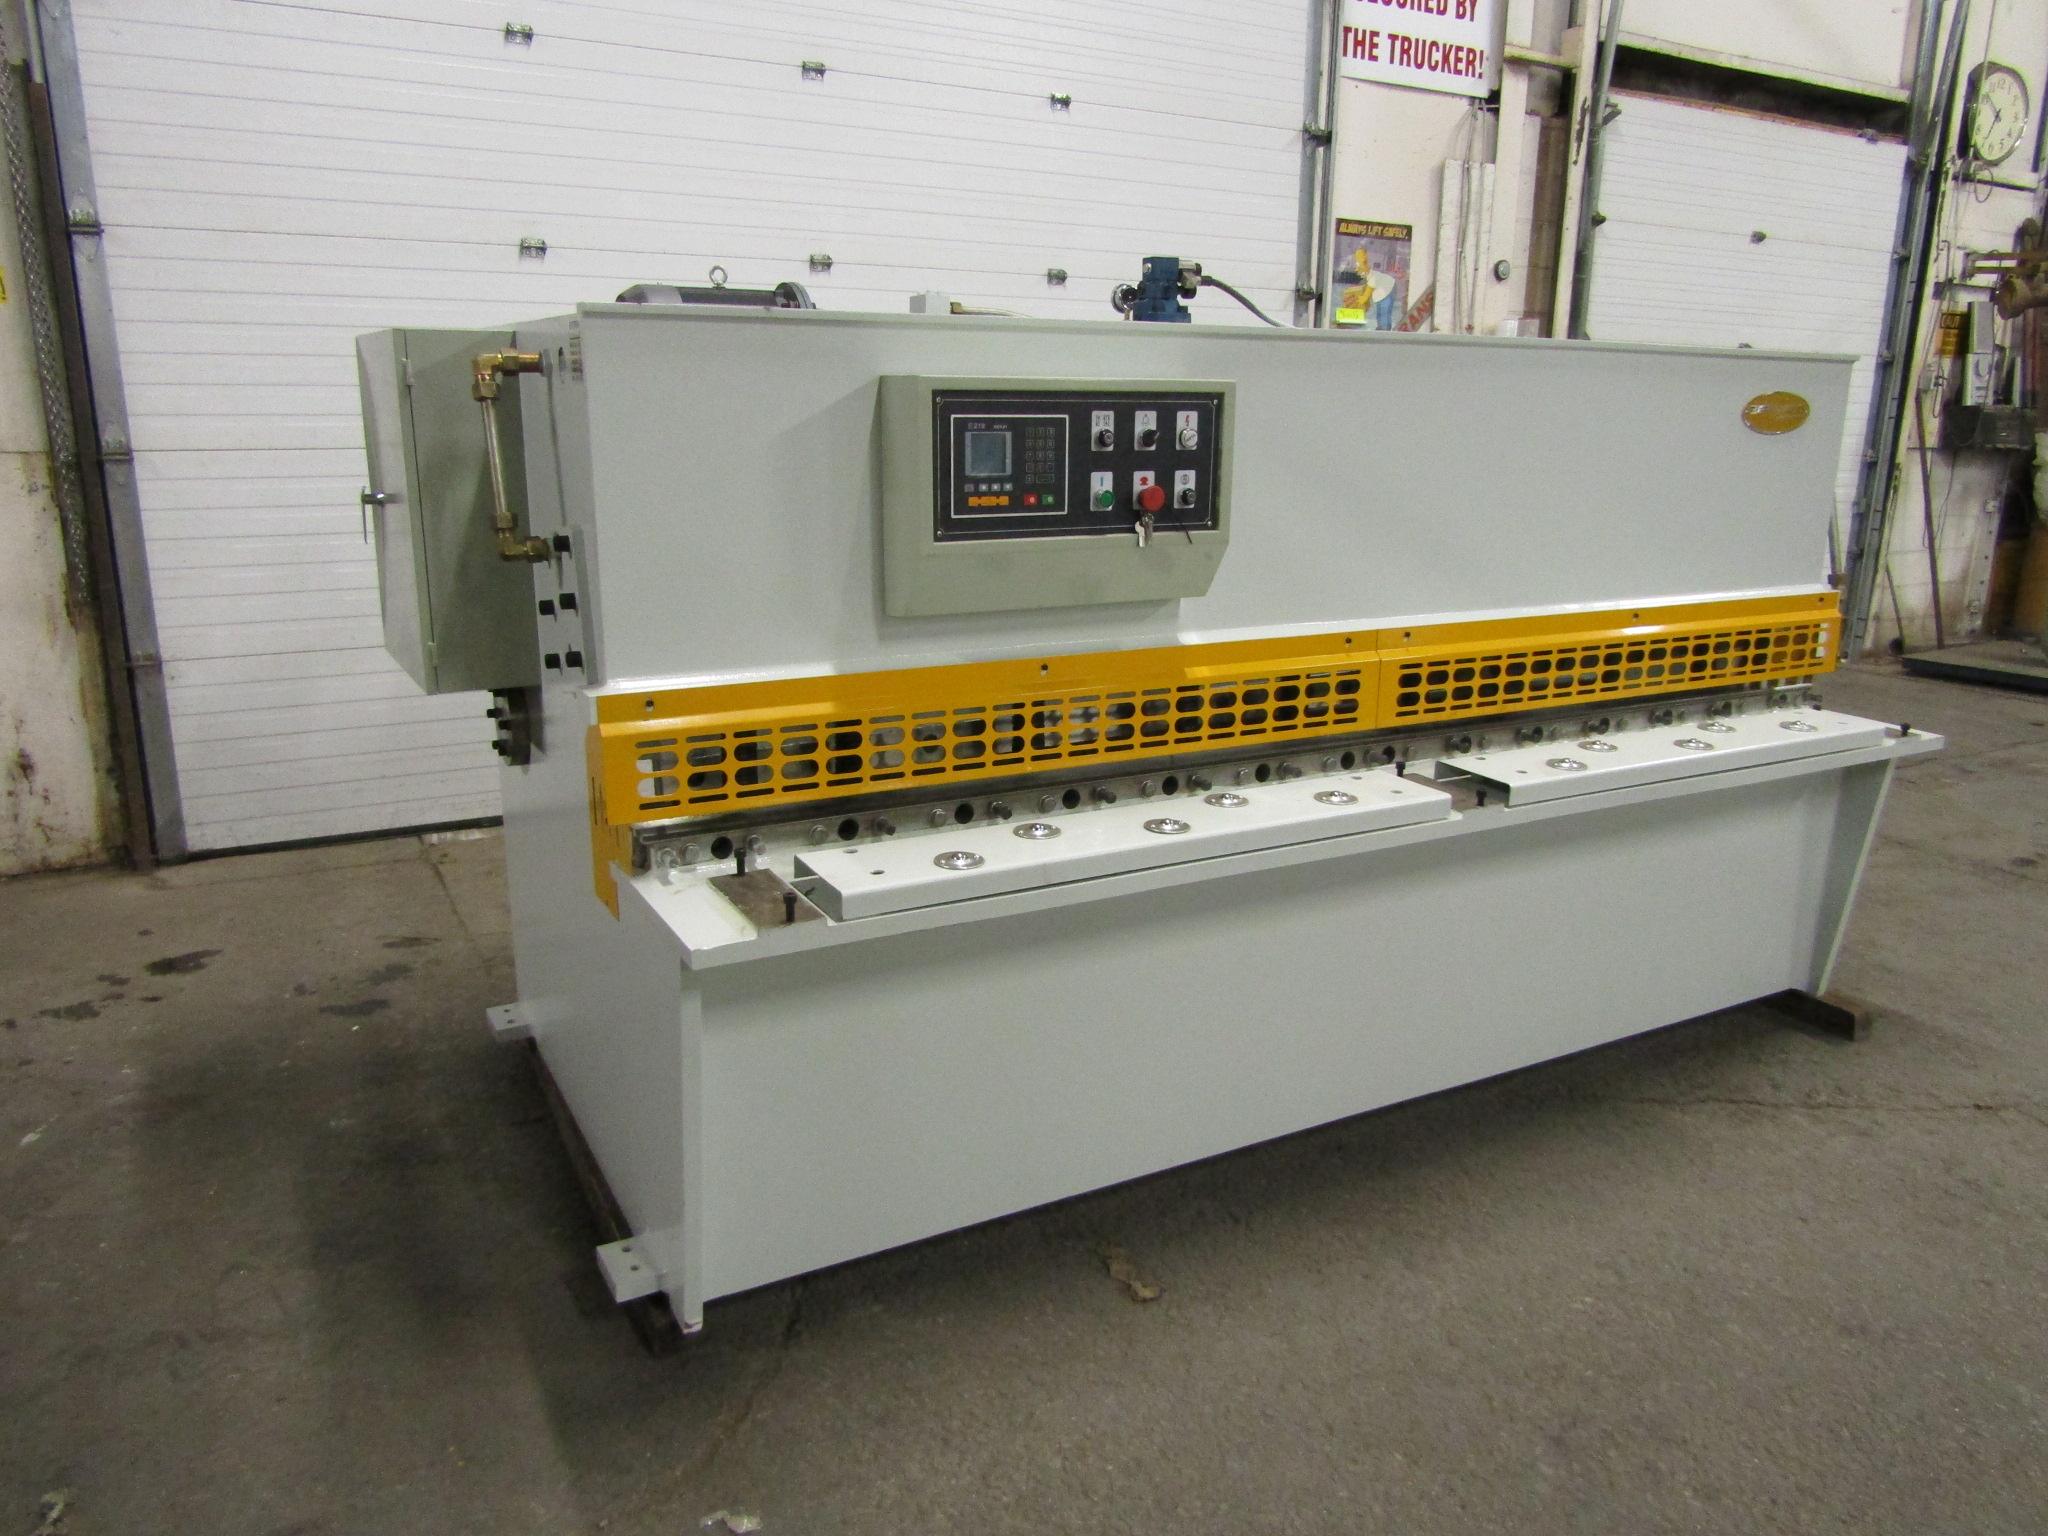 "Lot 233 - Bernardo Hydraulic Shear 3/16"" max capacity 98"" width - 480/575V 3 phase MINT UNUSED UNIT complete"